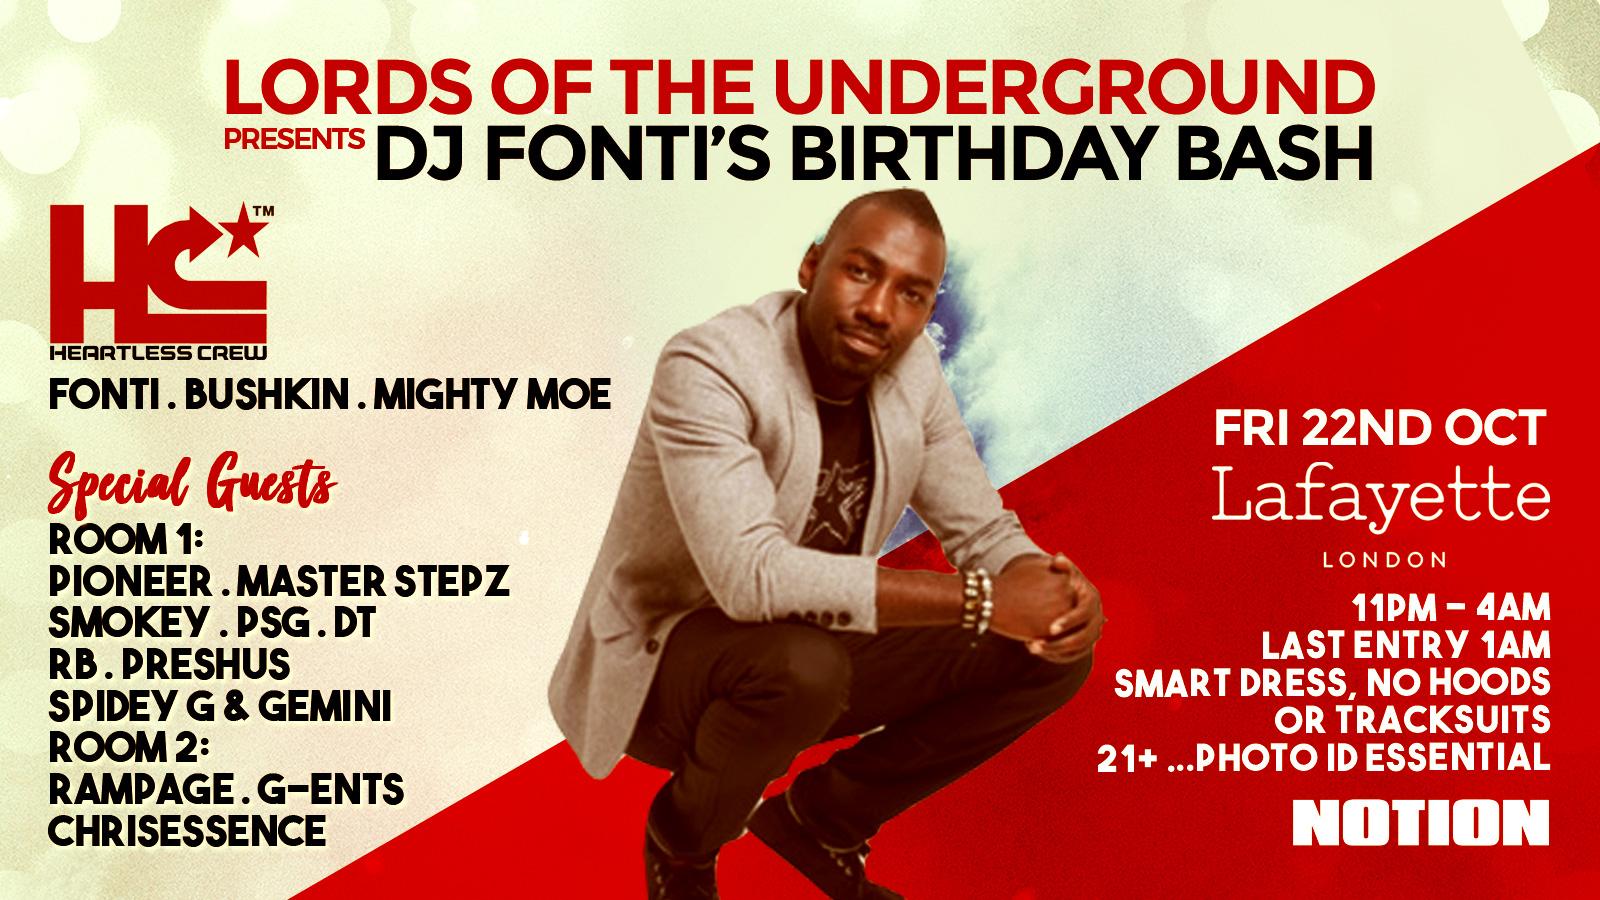 Lords of the Underground presents DJ Fonti's Birthday Bash